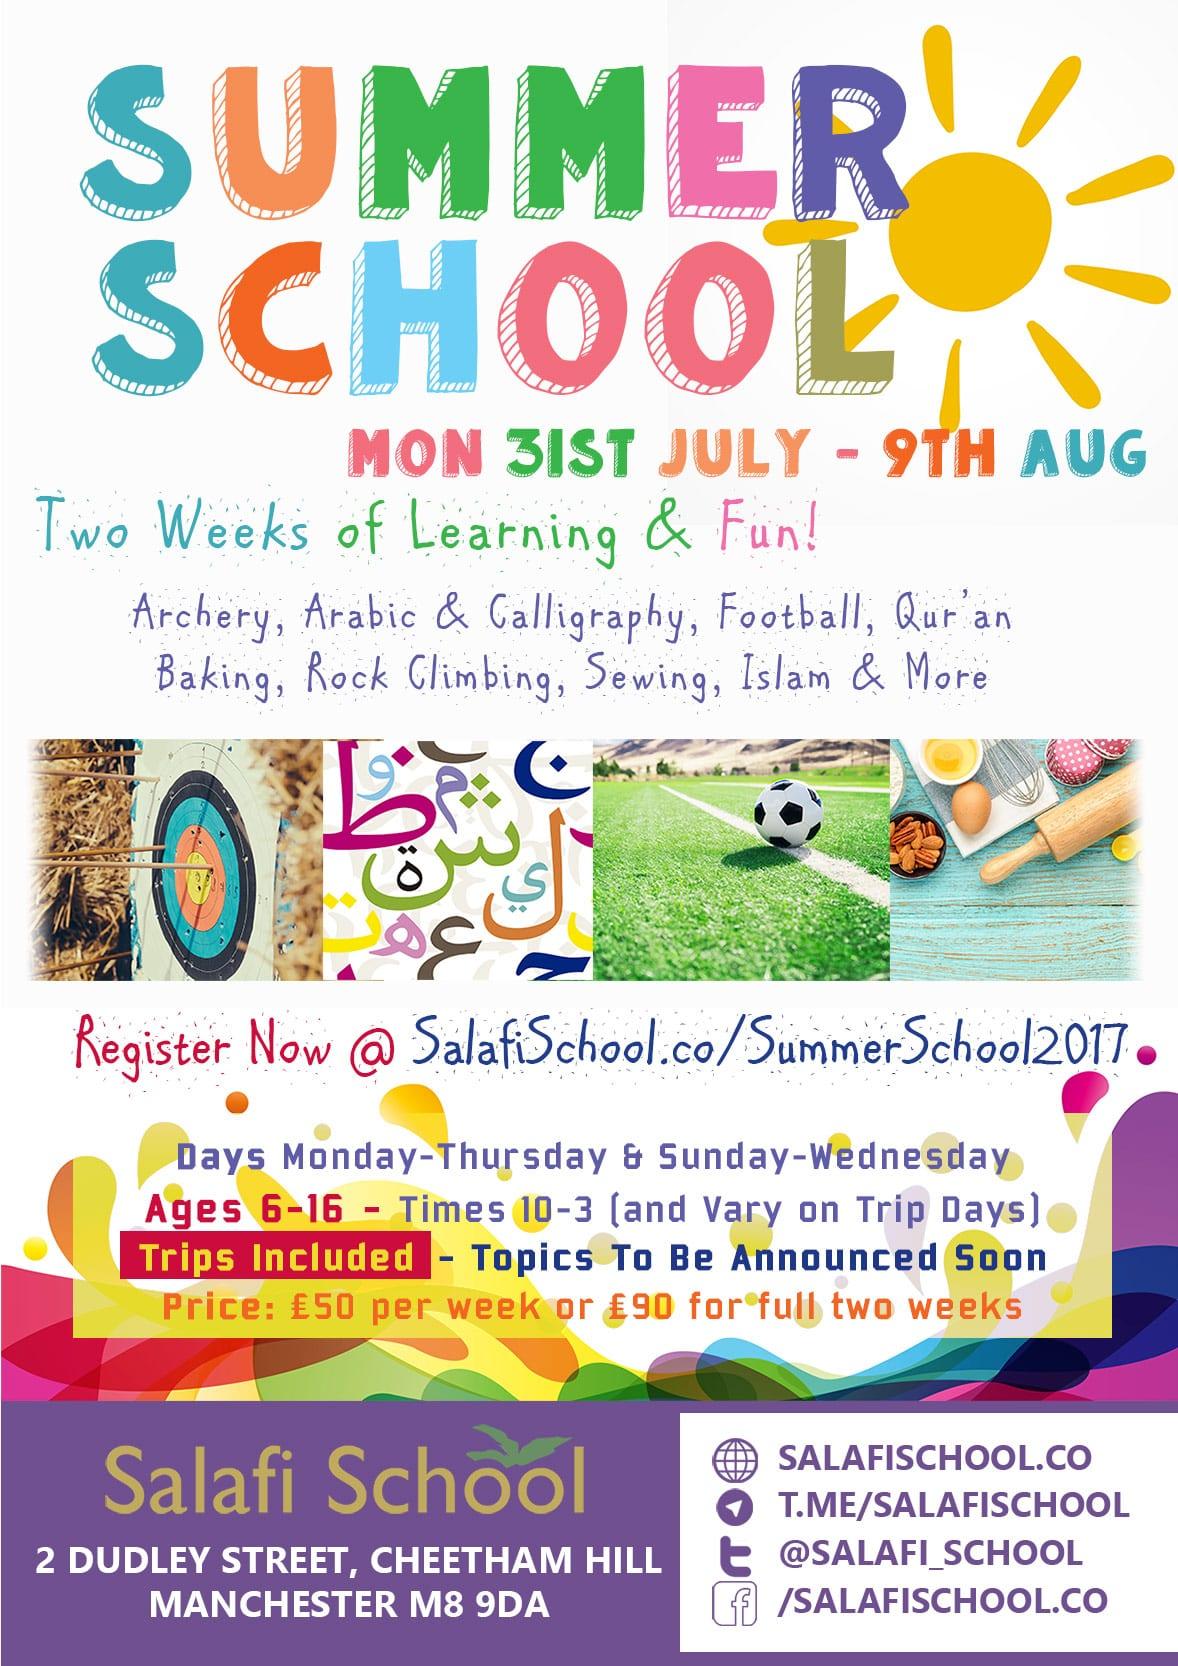 Summer School 2017 – Sign Up Your Children for Two Weeks of Activities, Tarbiyyah & Trips